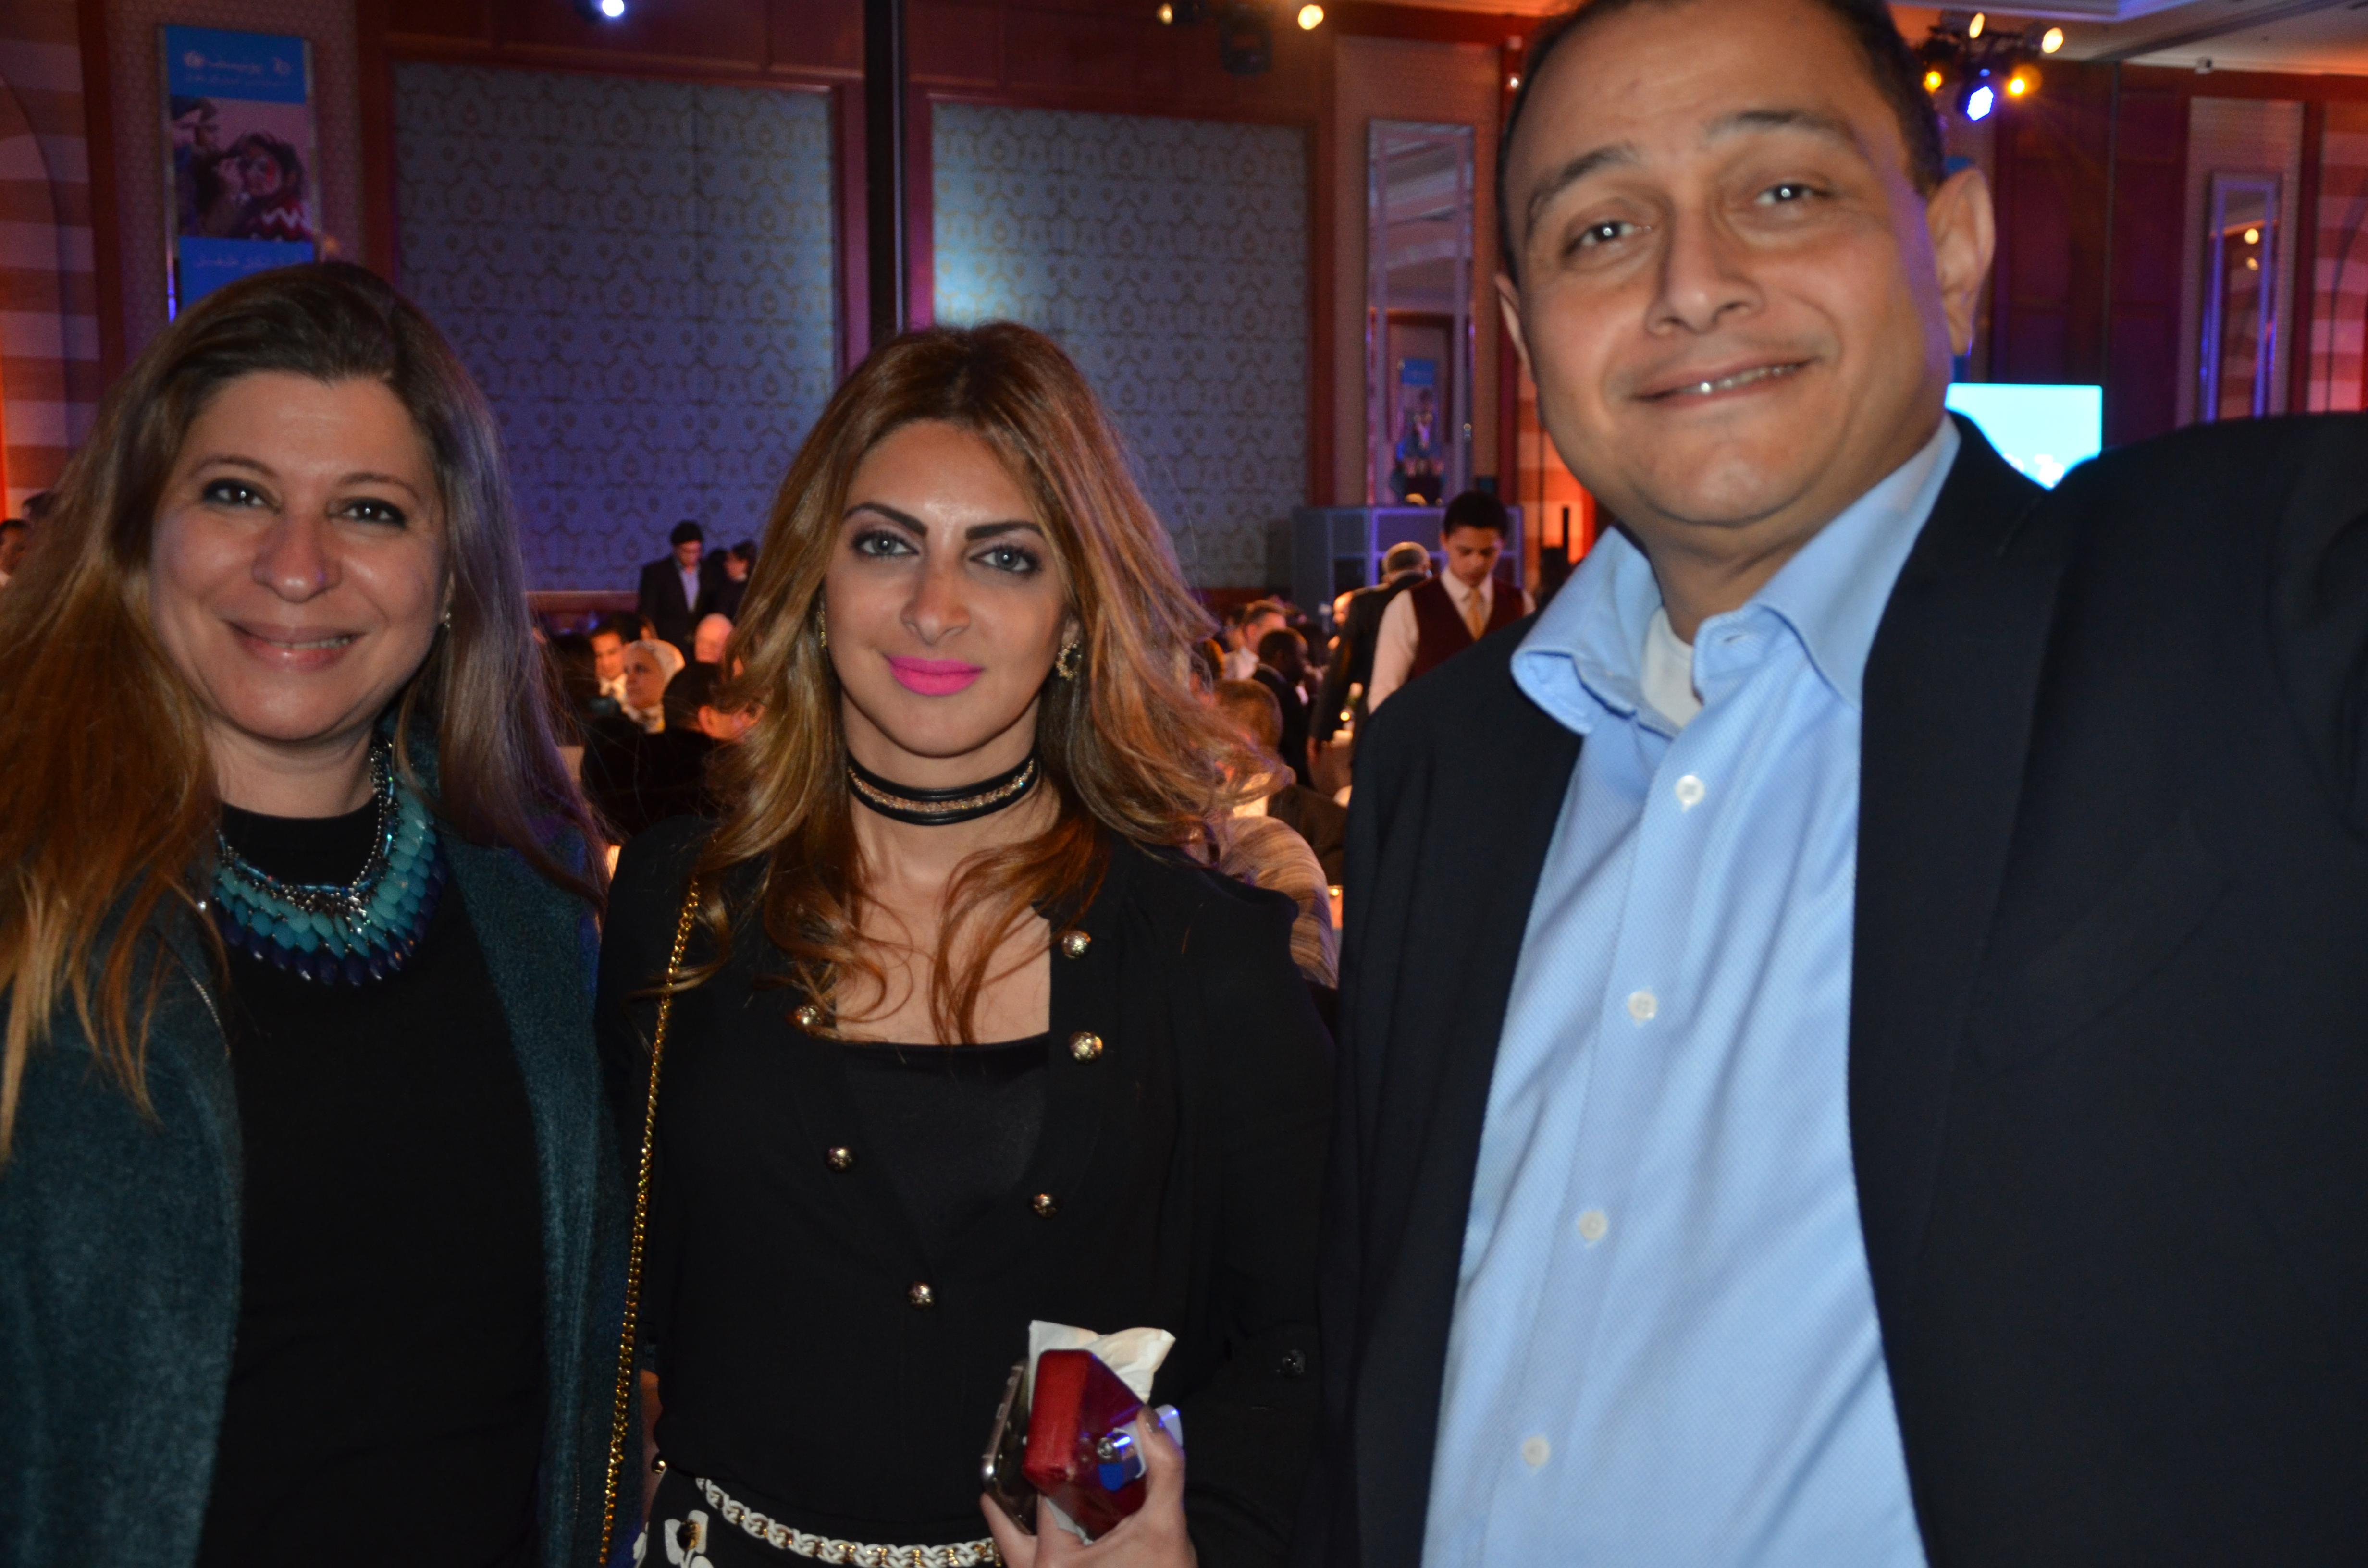 Ms. Noha Saad, Ms. Heba El Sewedy & Mr. Ashraf Haridy